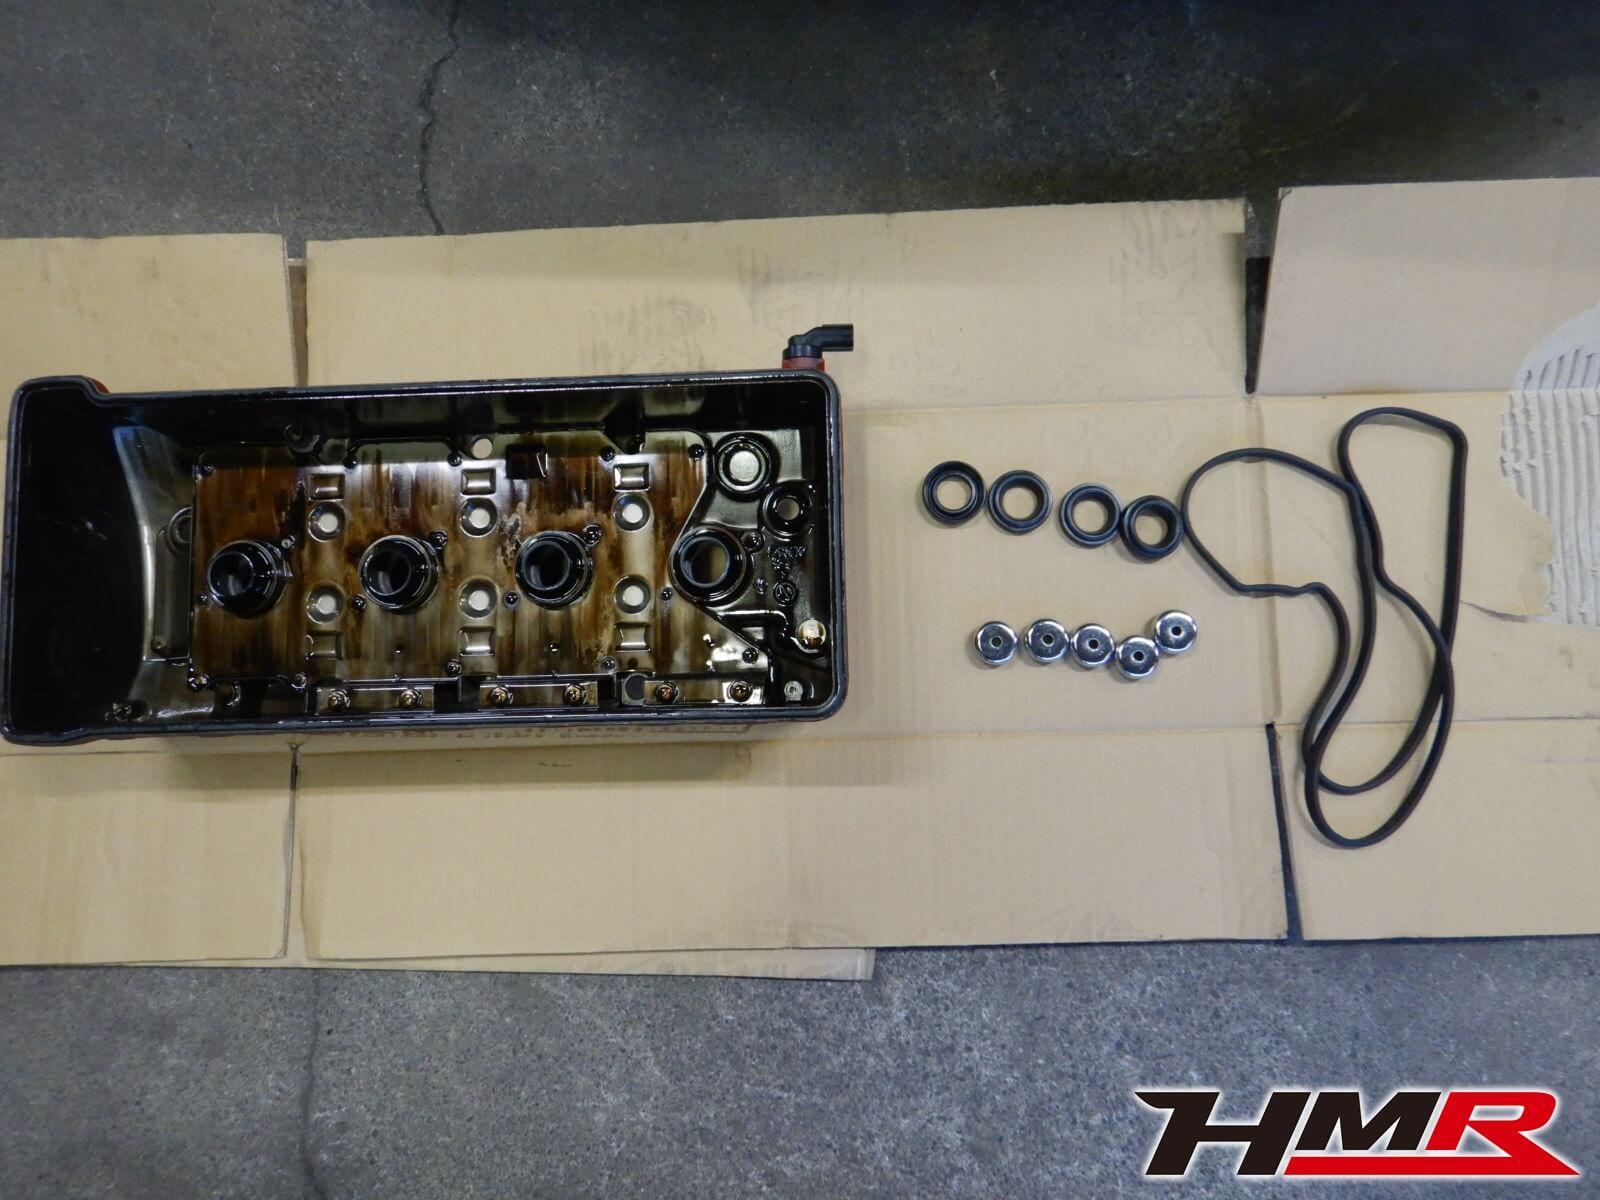 S2000(AP1)ヘッドカバーパッキン交換